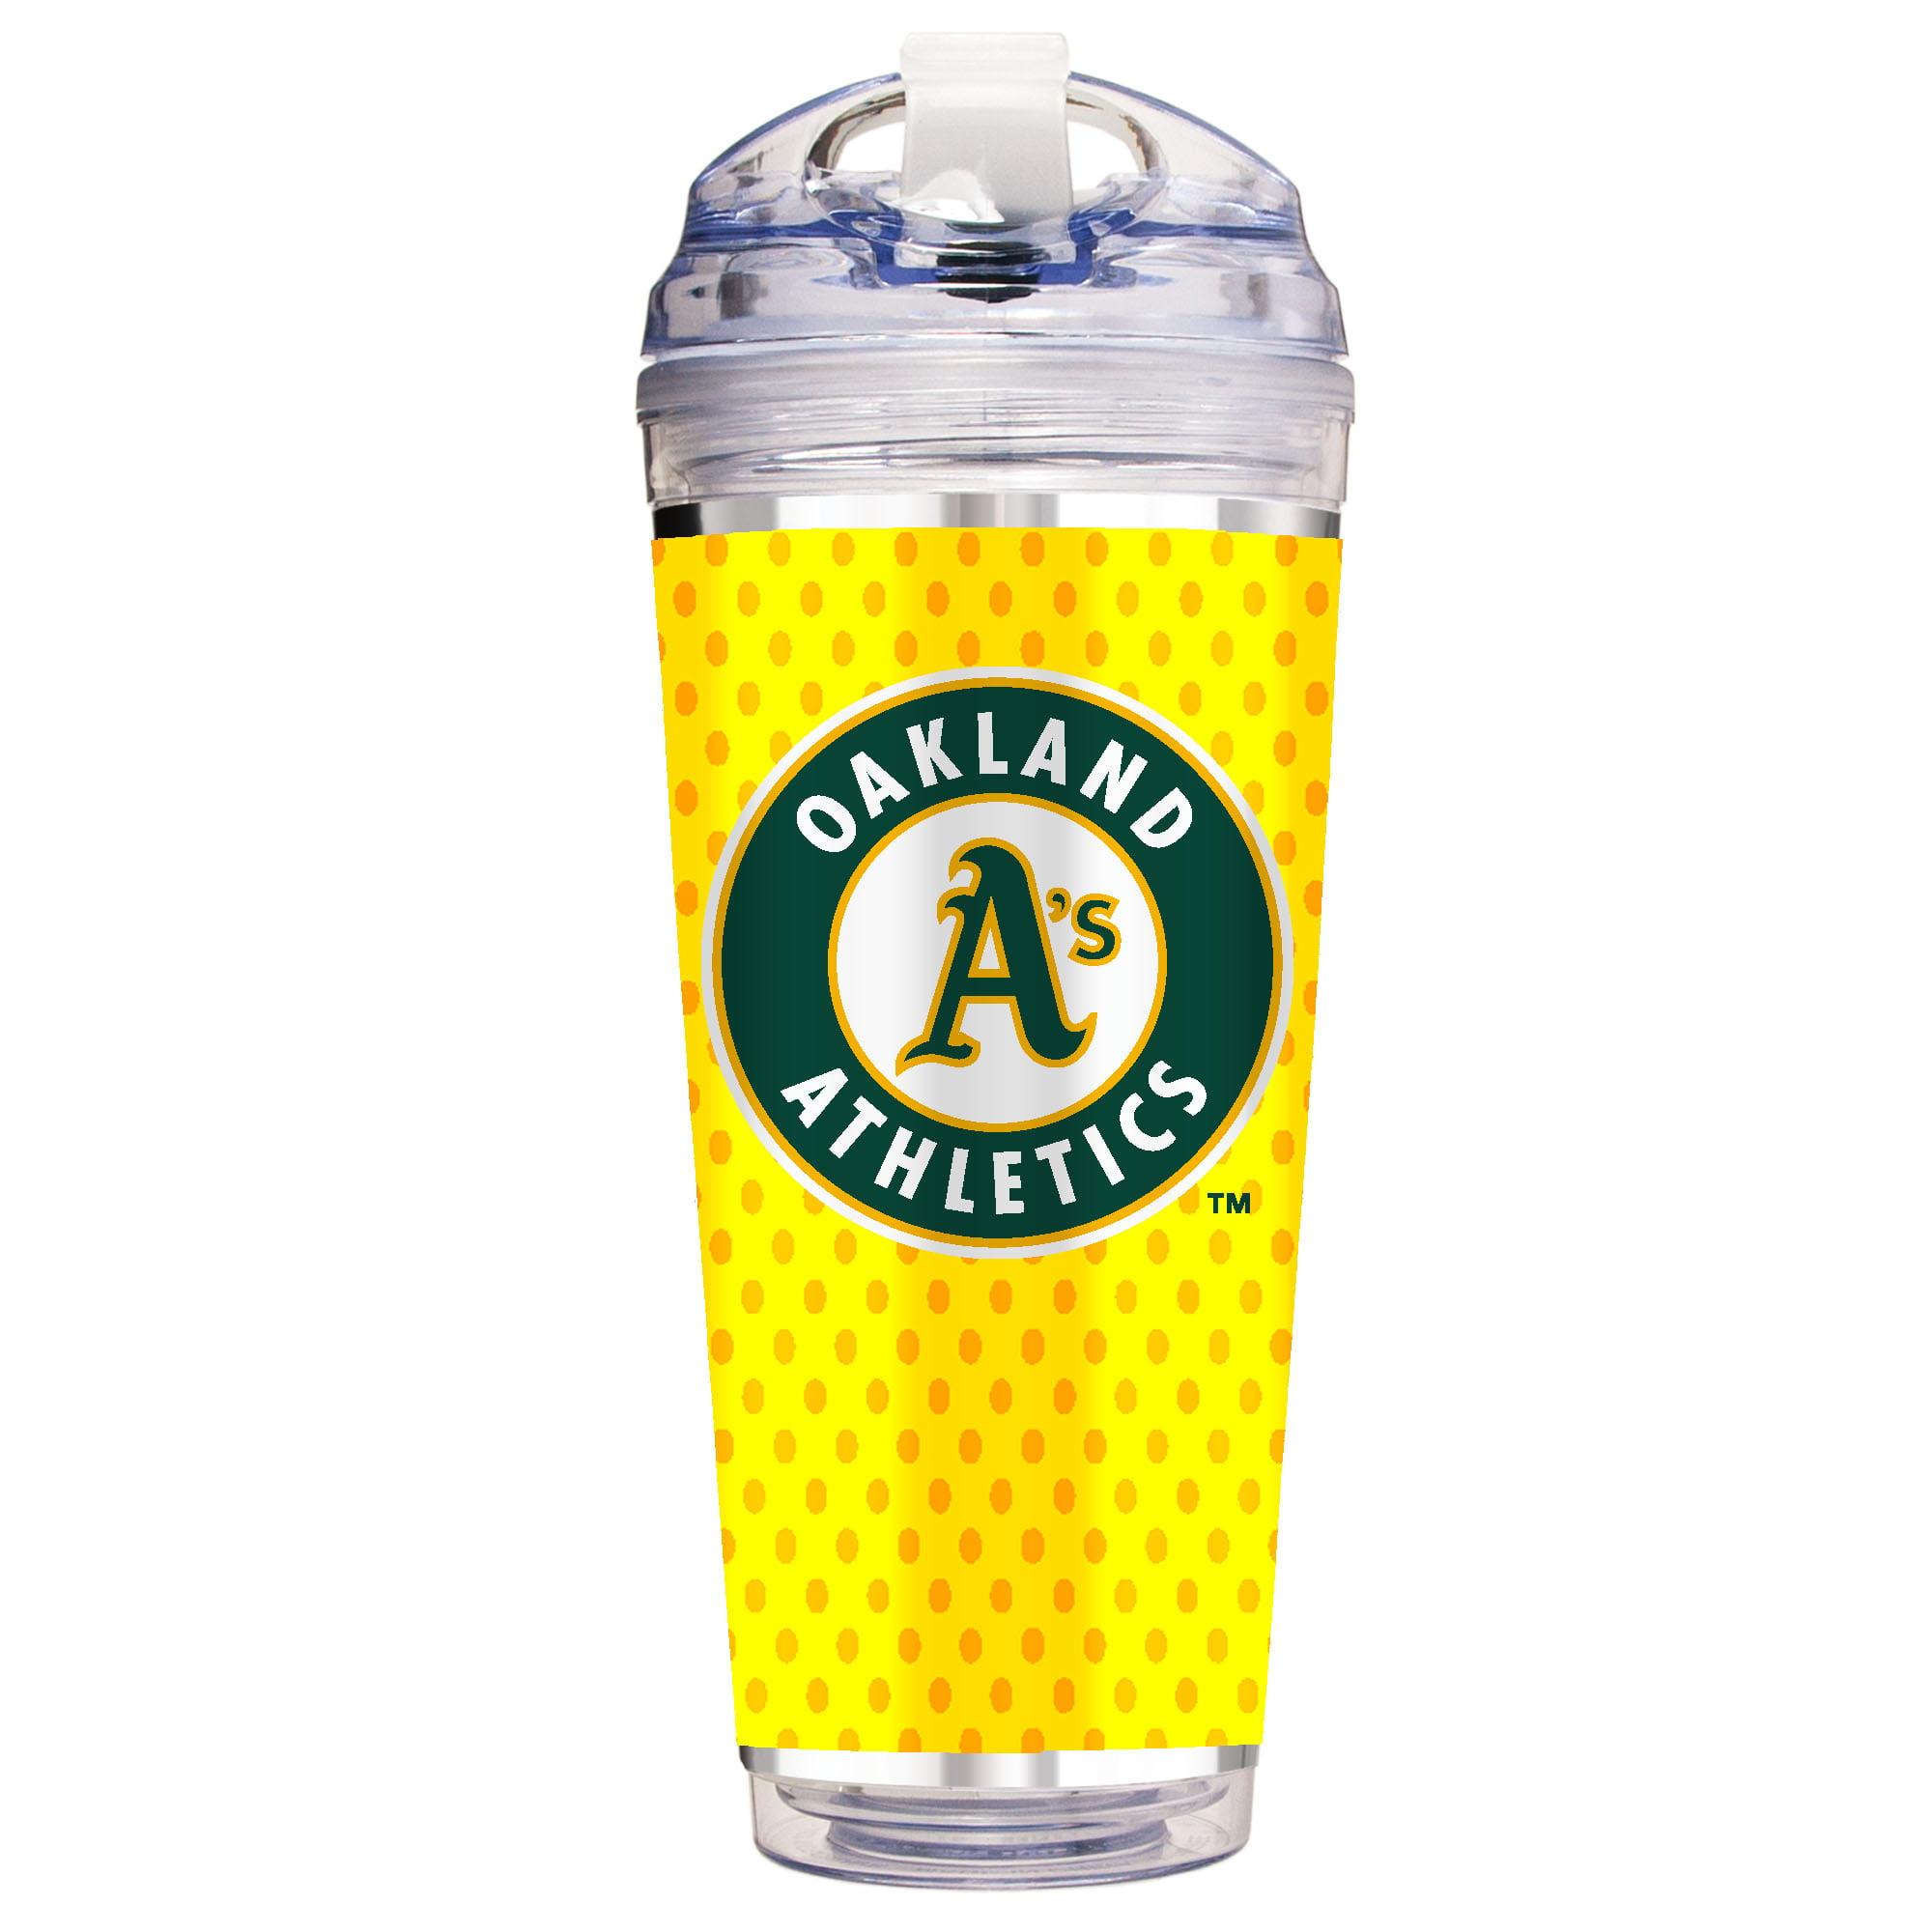 Oakland Athletics 2018 Players' Weekend 24oz. Acrylic Tumbler - No Size